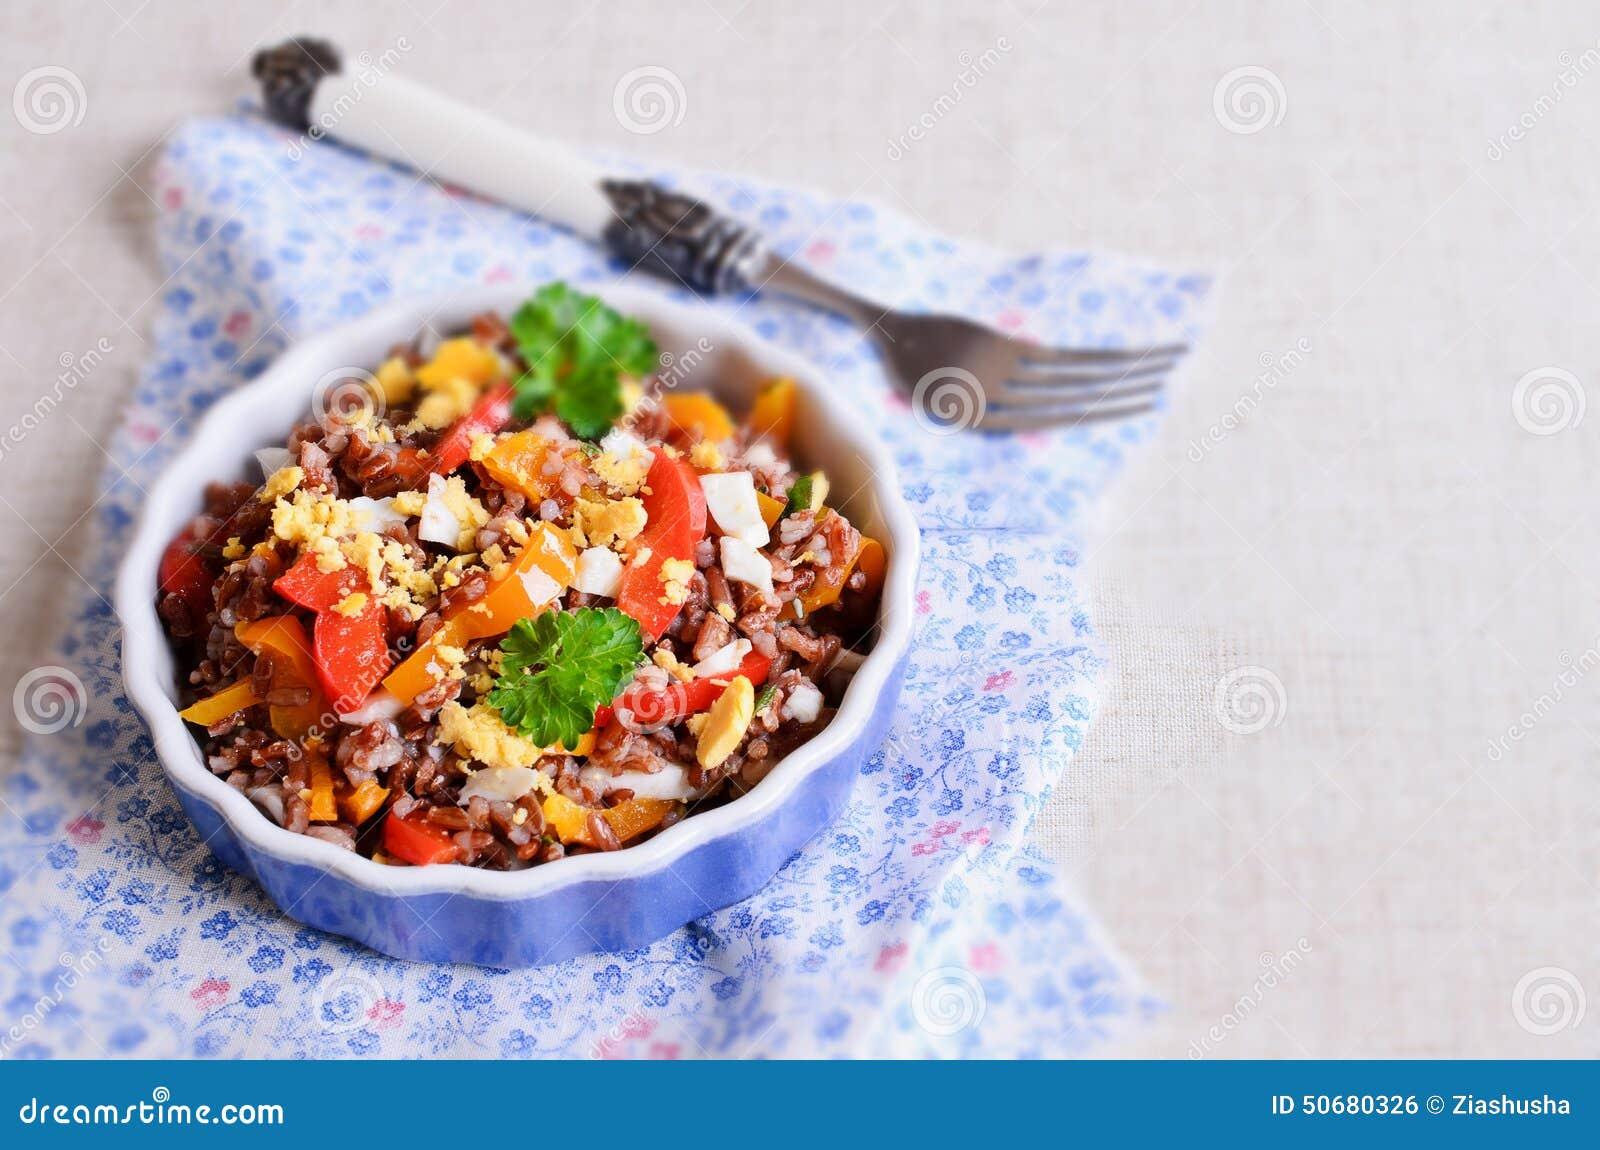 Download 与菜和鸡蛋的糙米 库存照片. 图片 包括有 装饰, 谷物, 美食, 正餐, 汉语, 捷克人, 烹调, 叶子 - 50680326